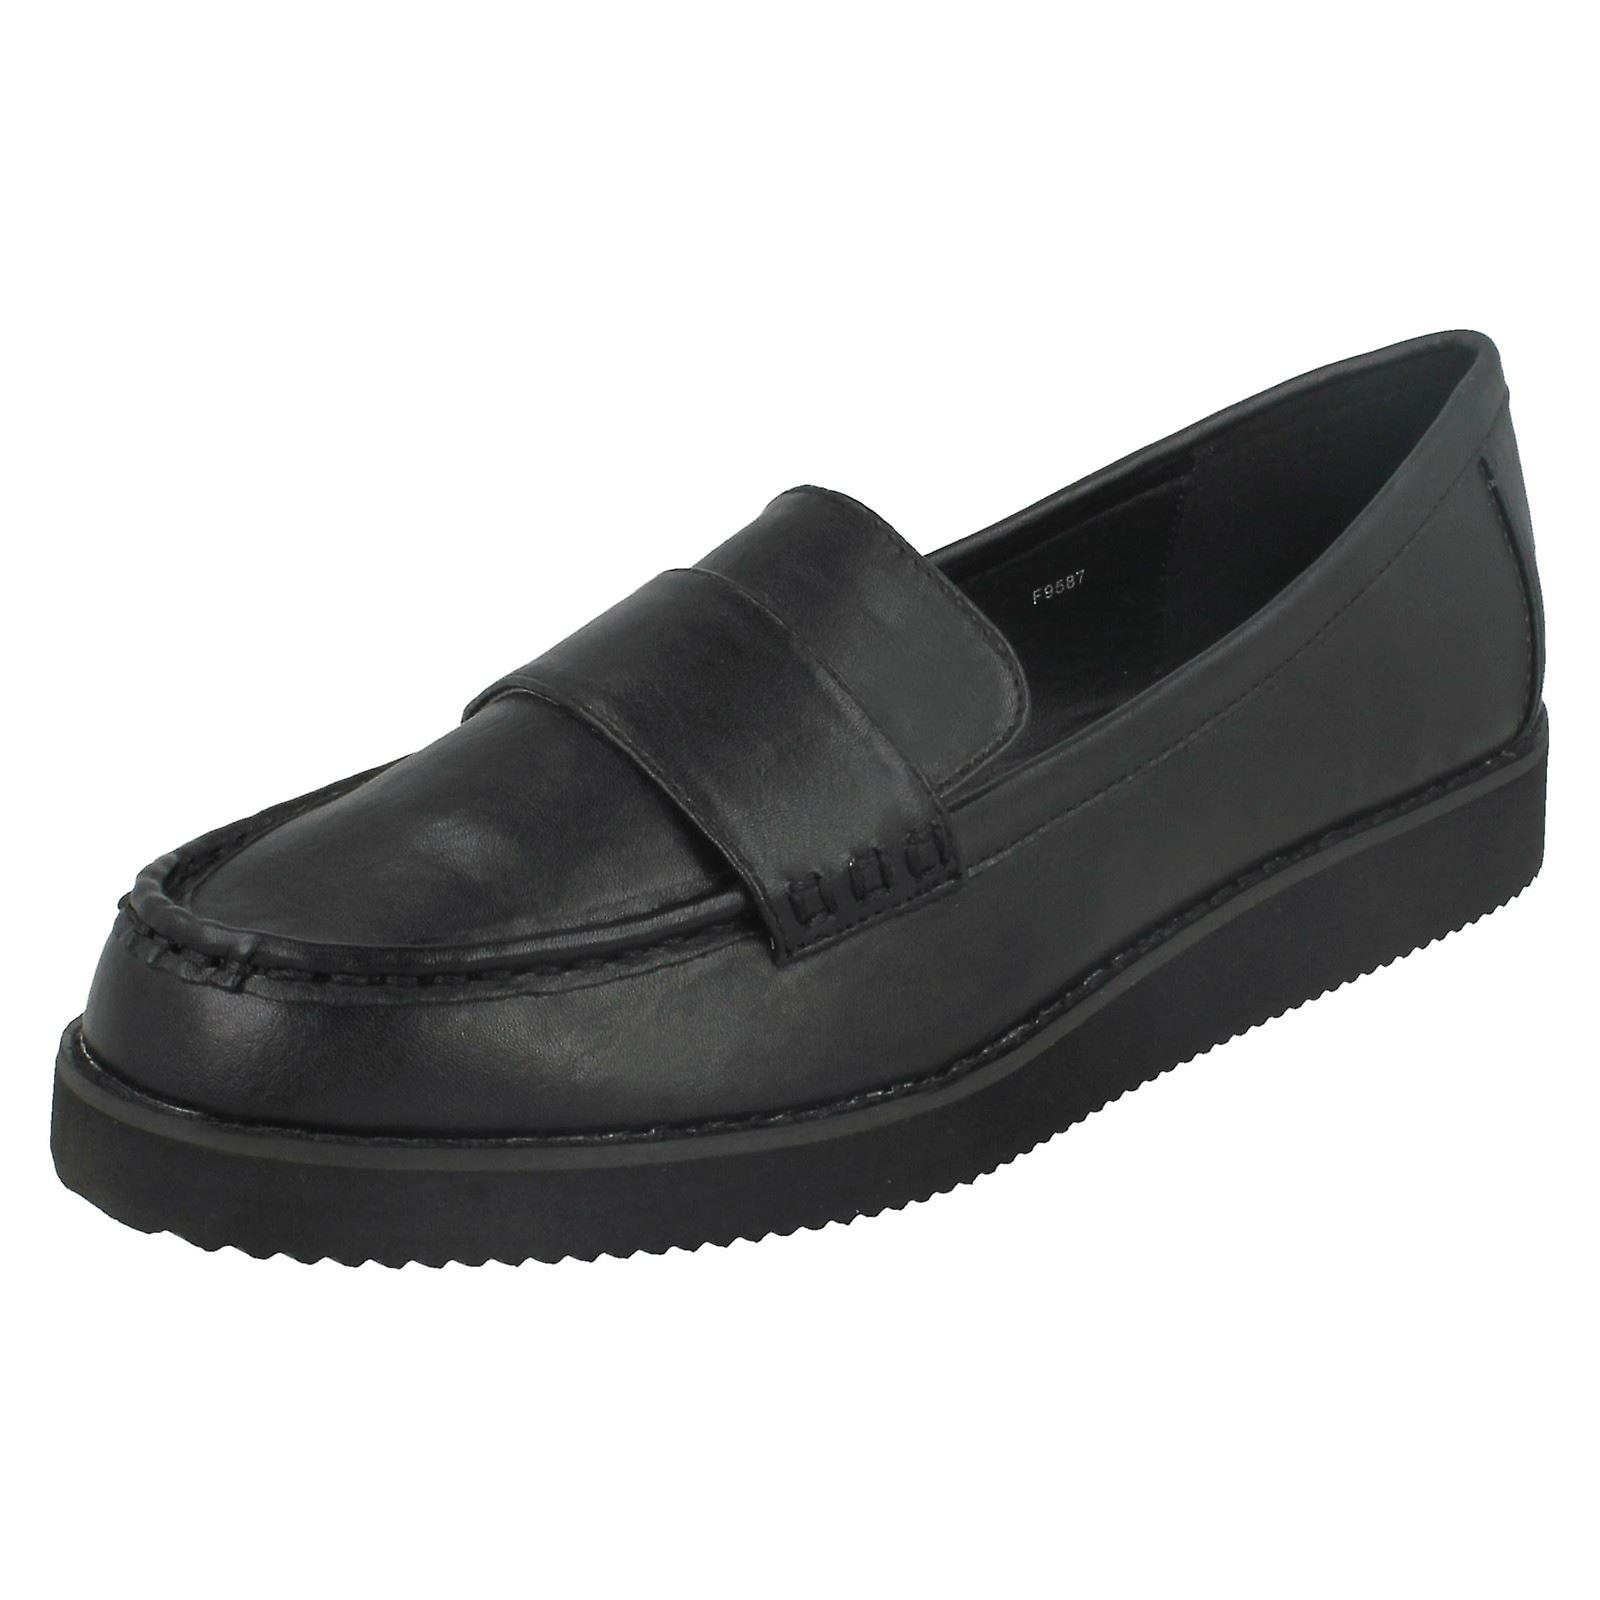 Damen-Spot auf Sattel Trim dicke Sohle Schuh